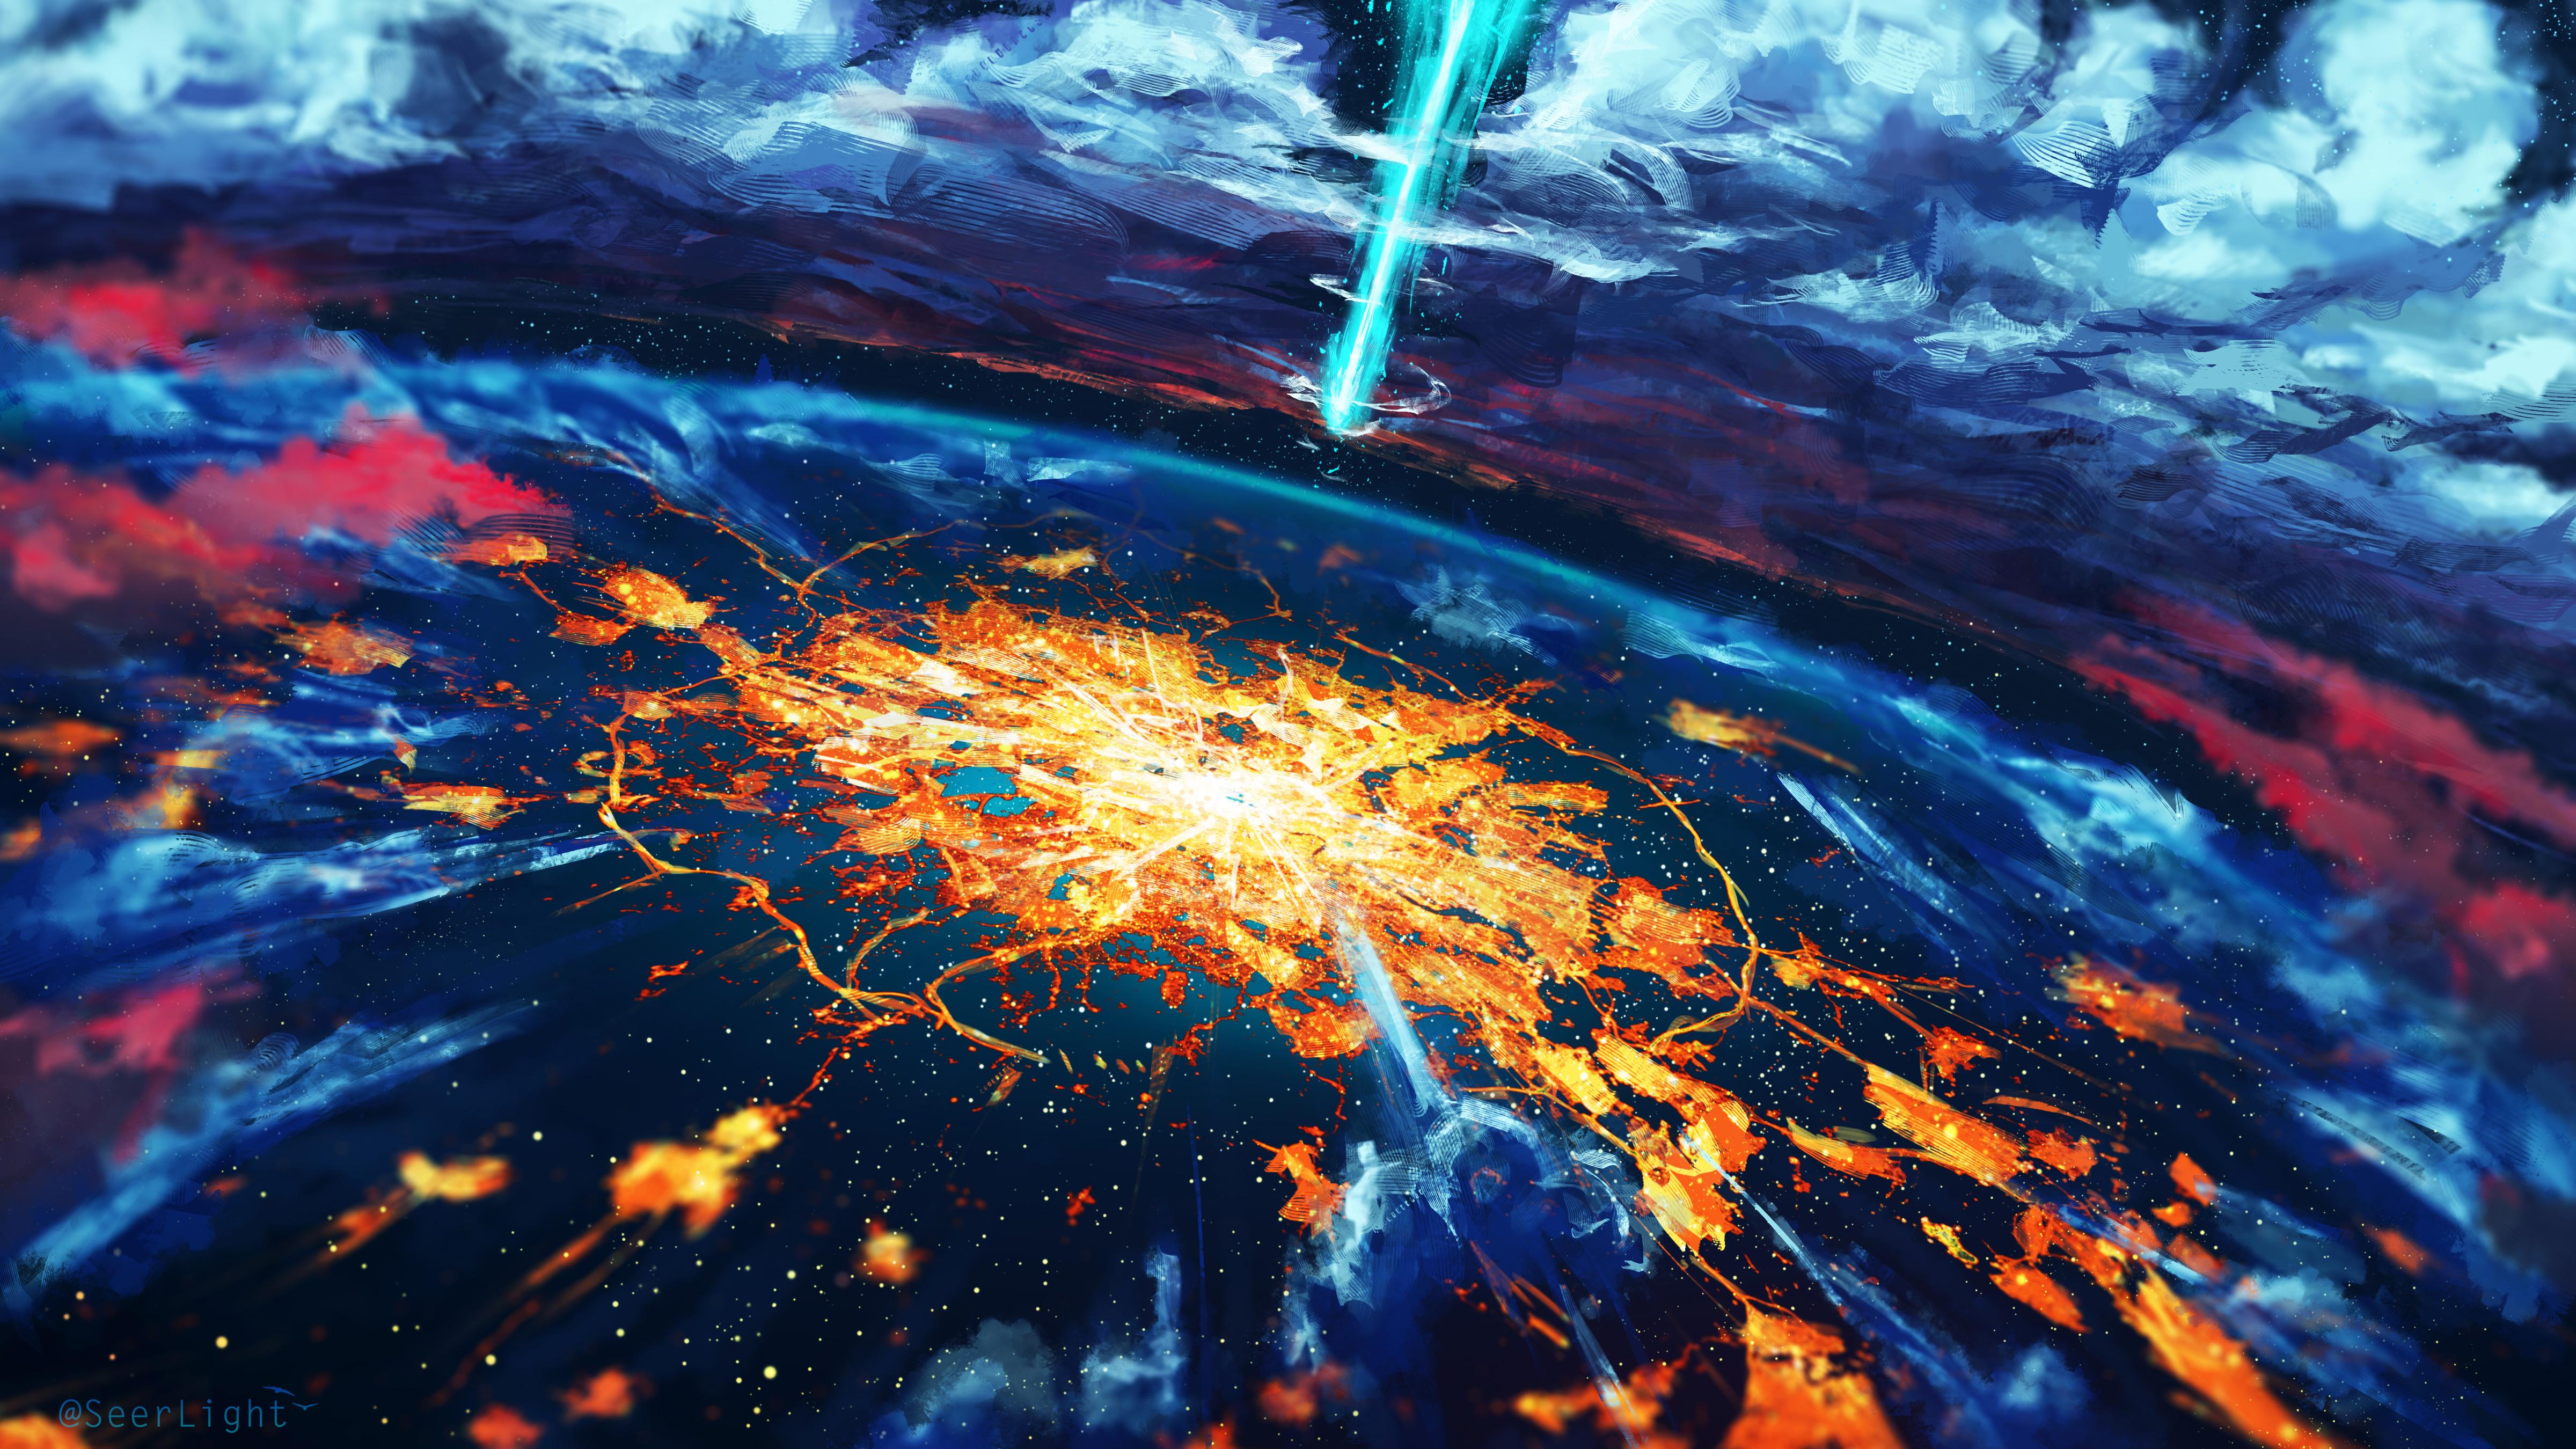 Apocalypse cosmos disaster explosion world hd artist 4k - Explosion wallpaper ...